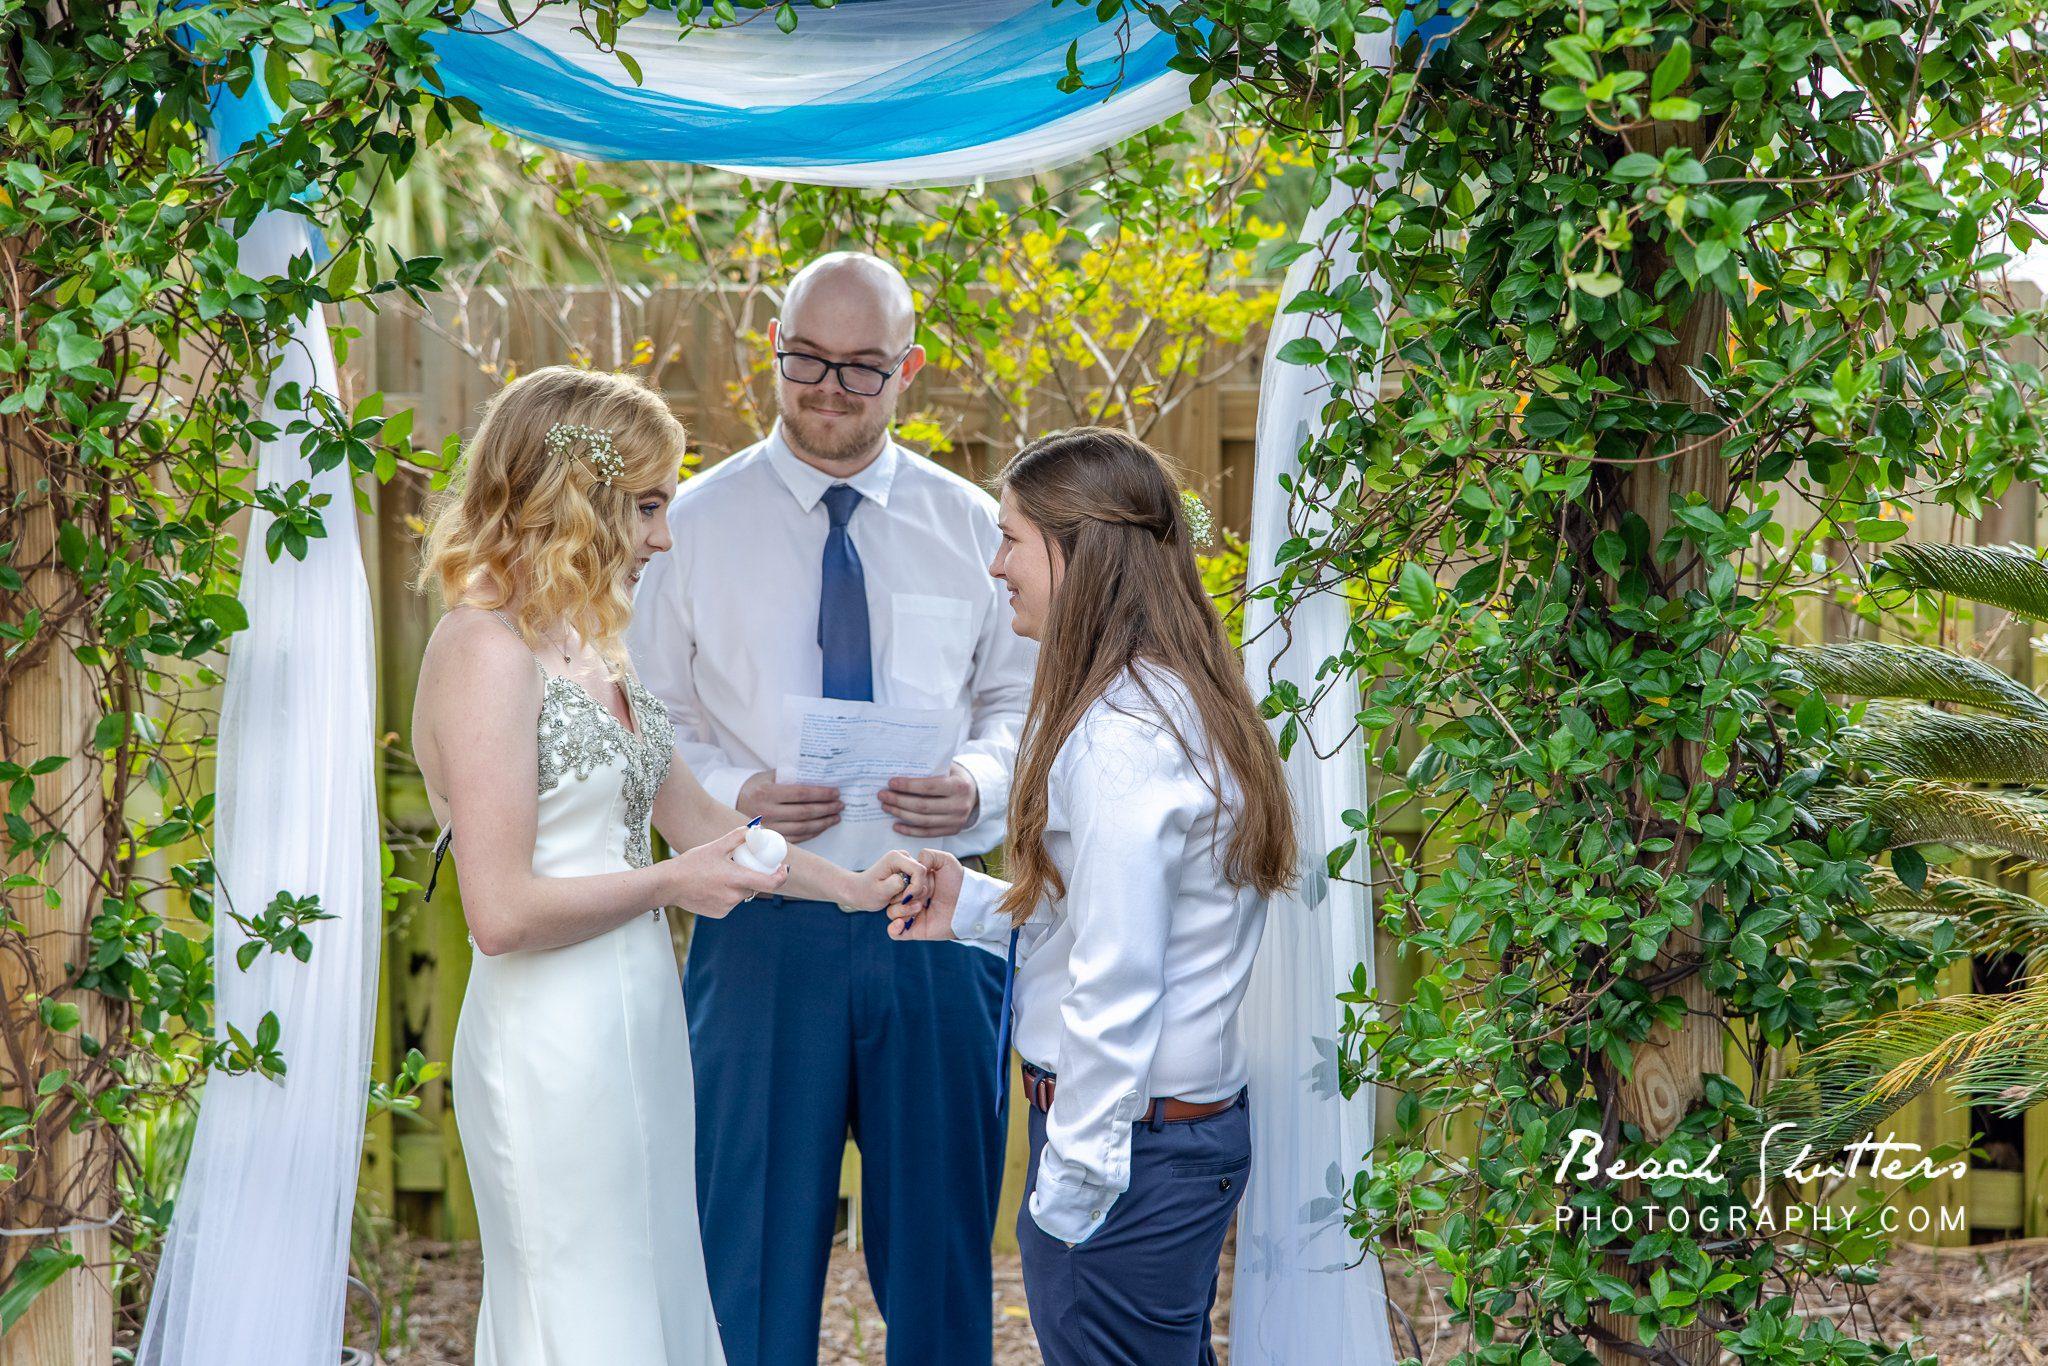 wedding vows at the beach